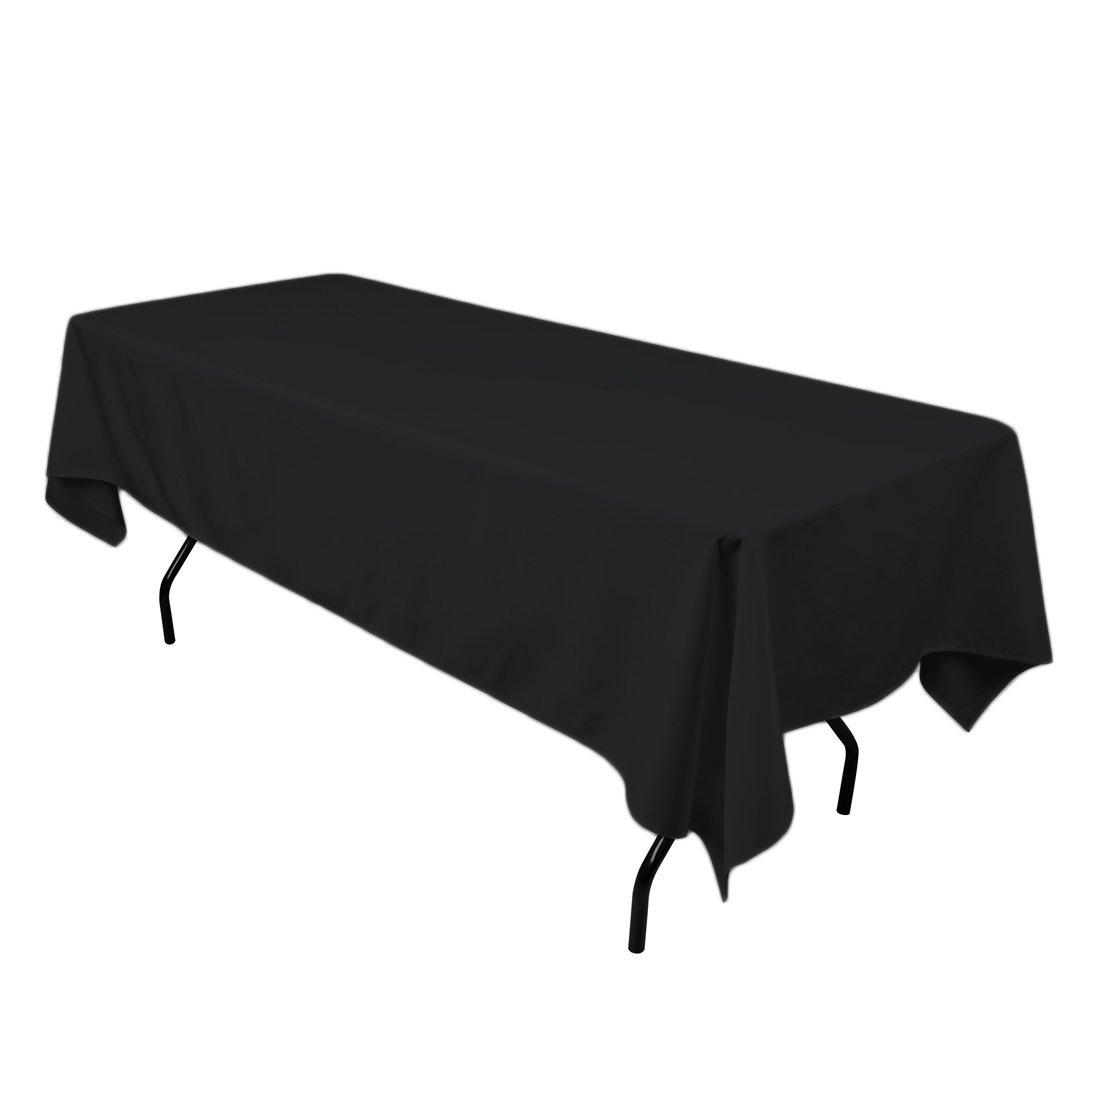 Design Black Tablecloth amazon com linentablecloth 60 x 102 inch rectangular polyester tablecloth black home kitchen